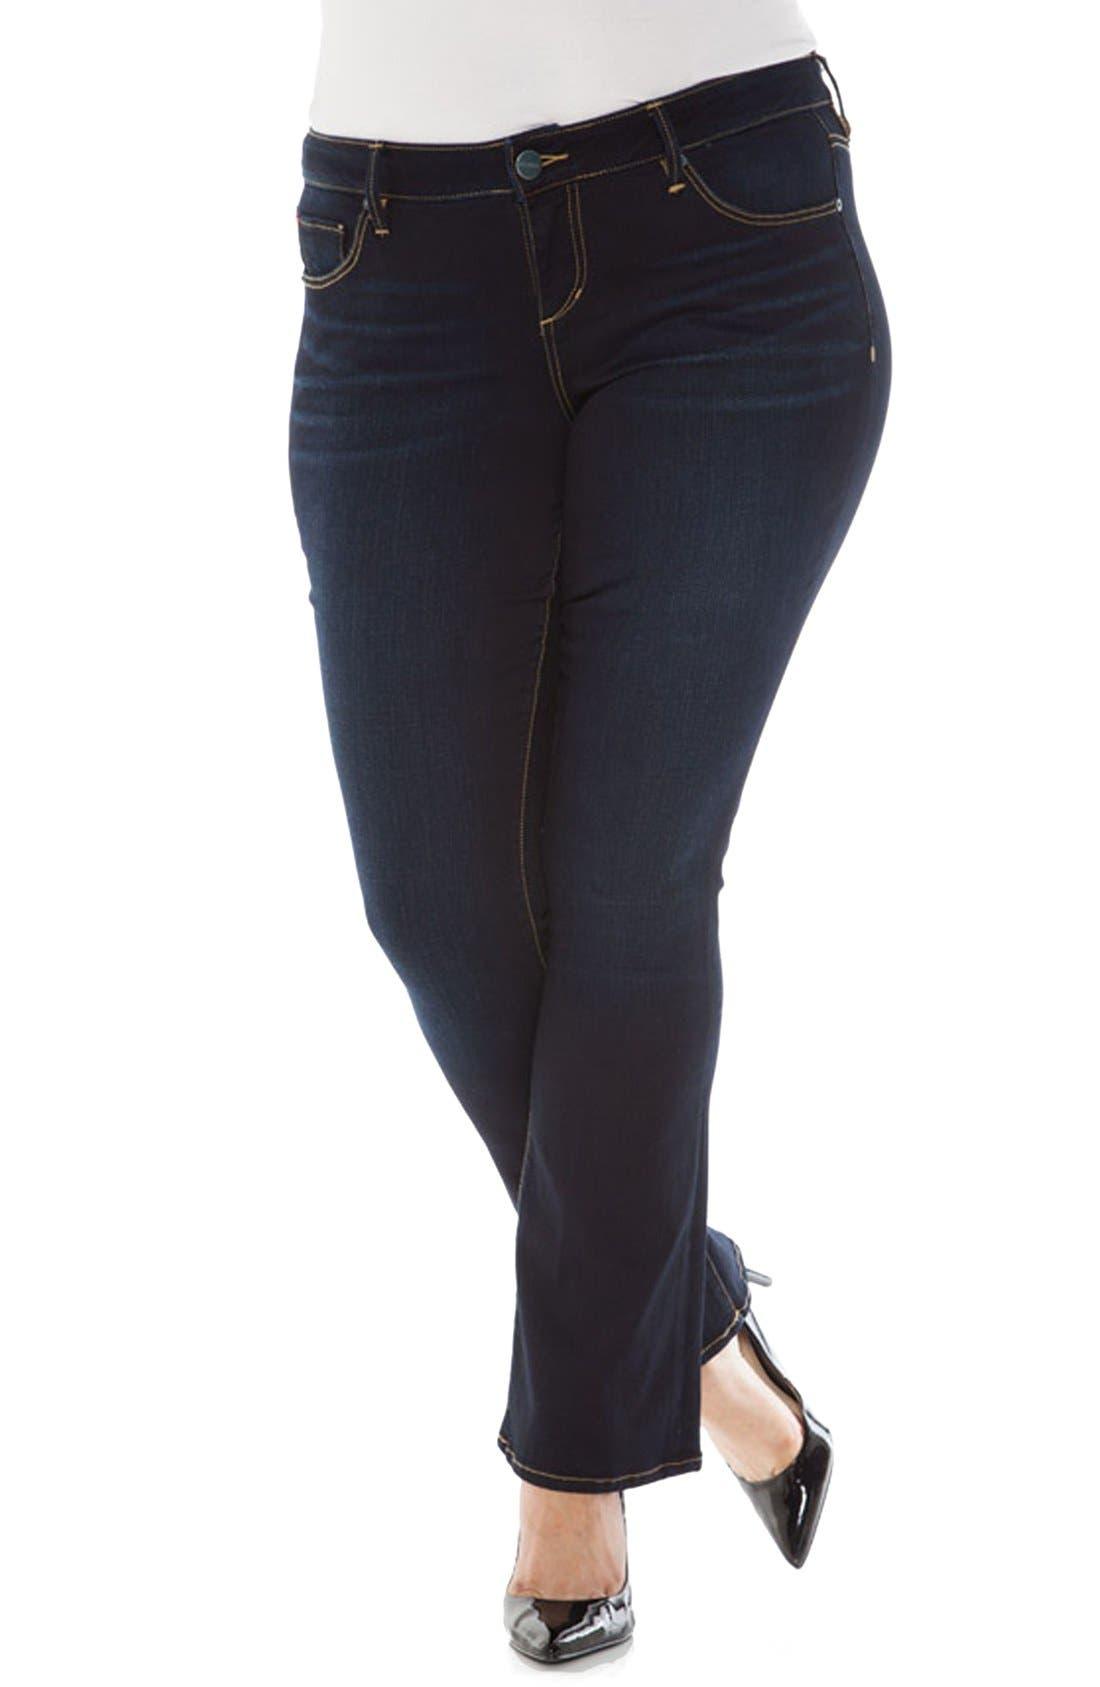 Low rise boot cut plus size jeans